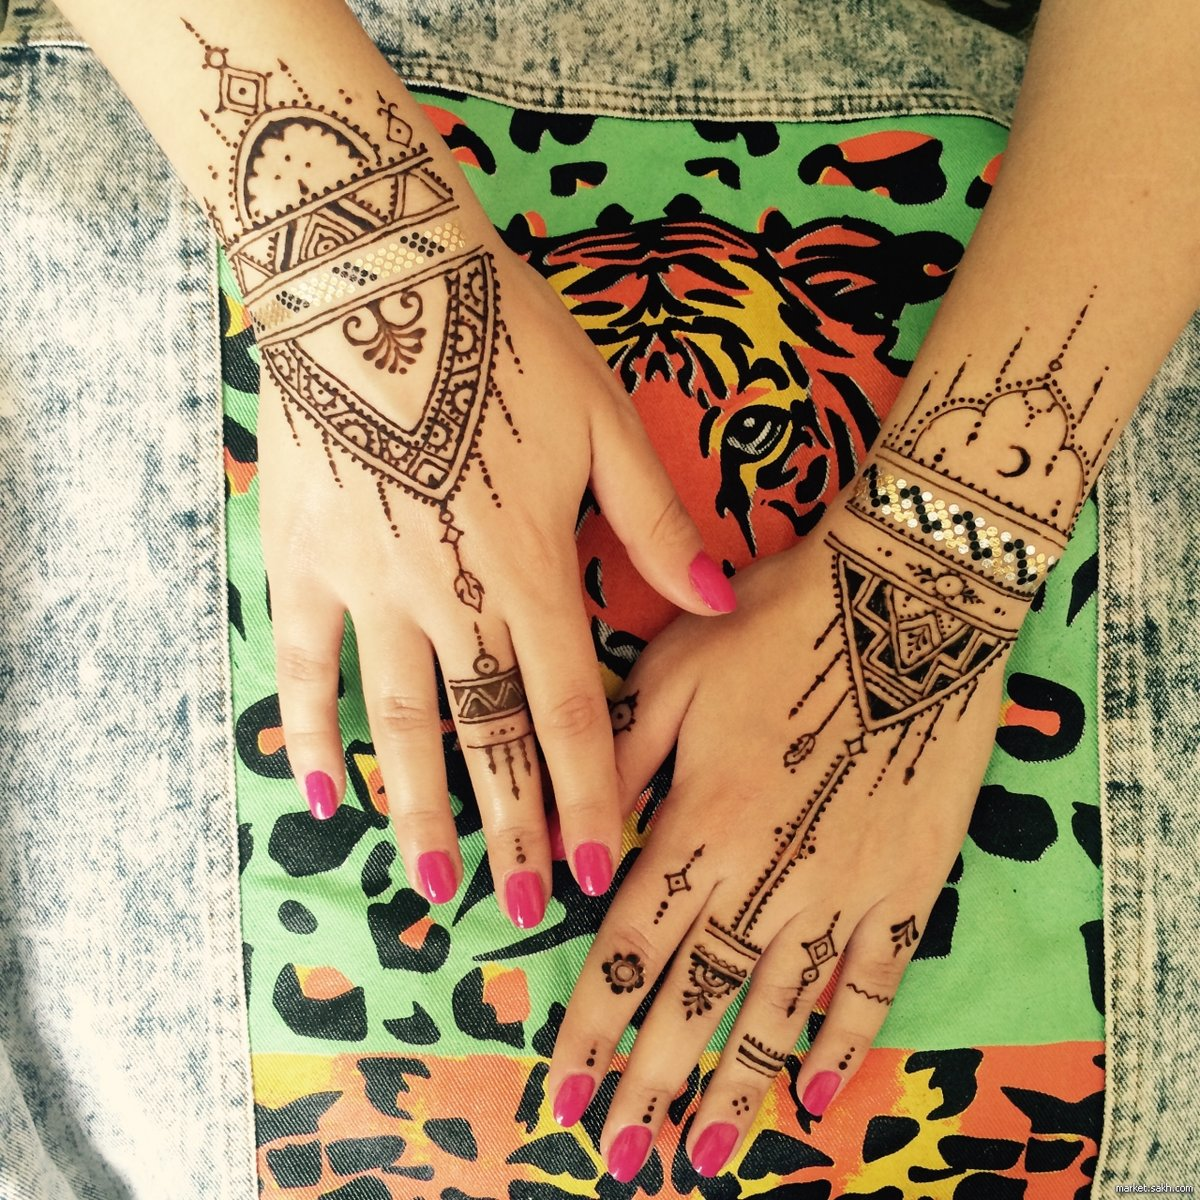 Рисунки хной на теле, роспись мехенди на животе и груди, хна для рисования на теле и росписи по коже